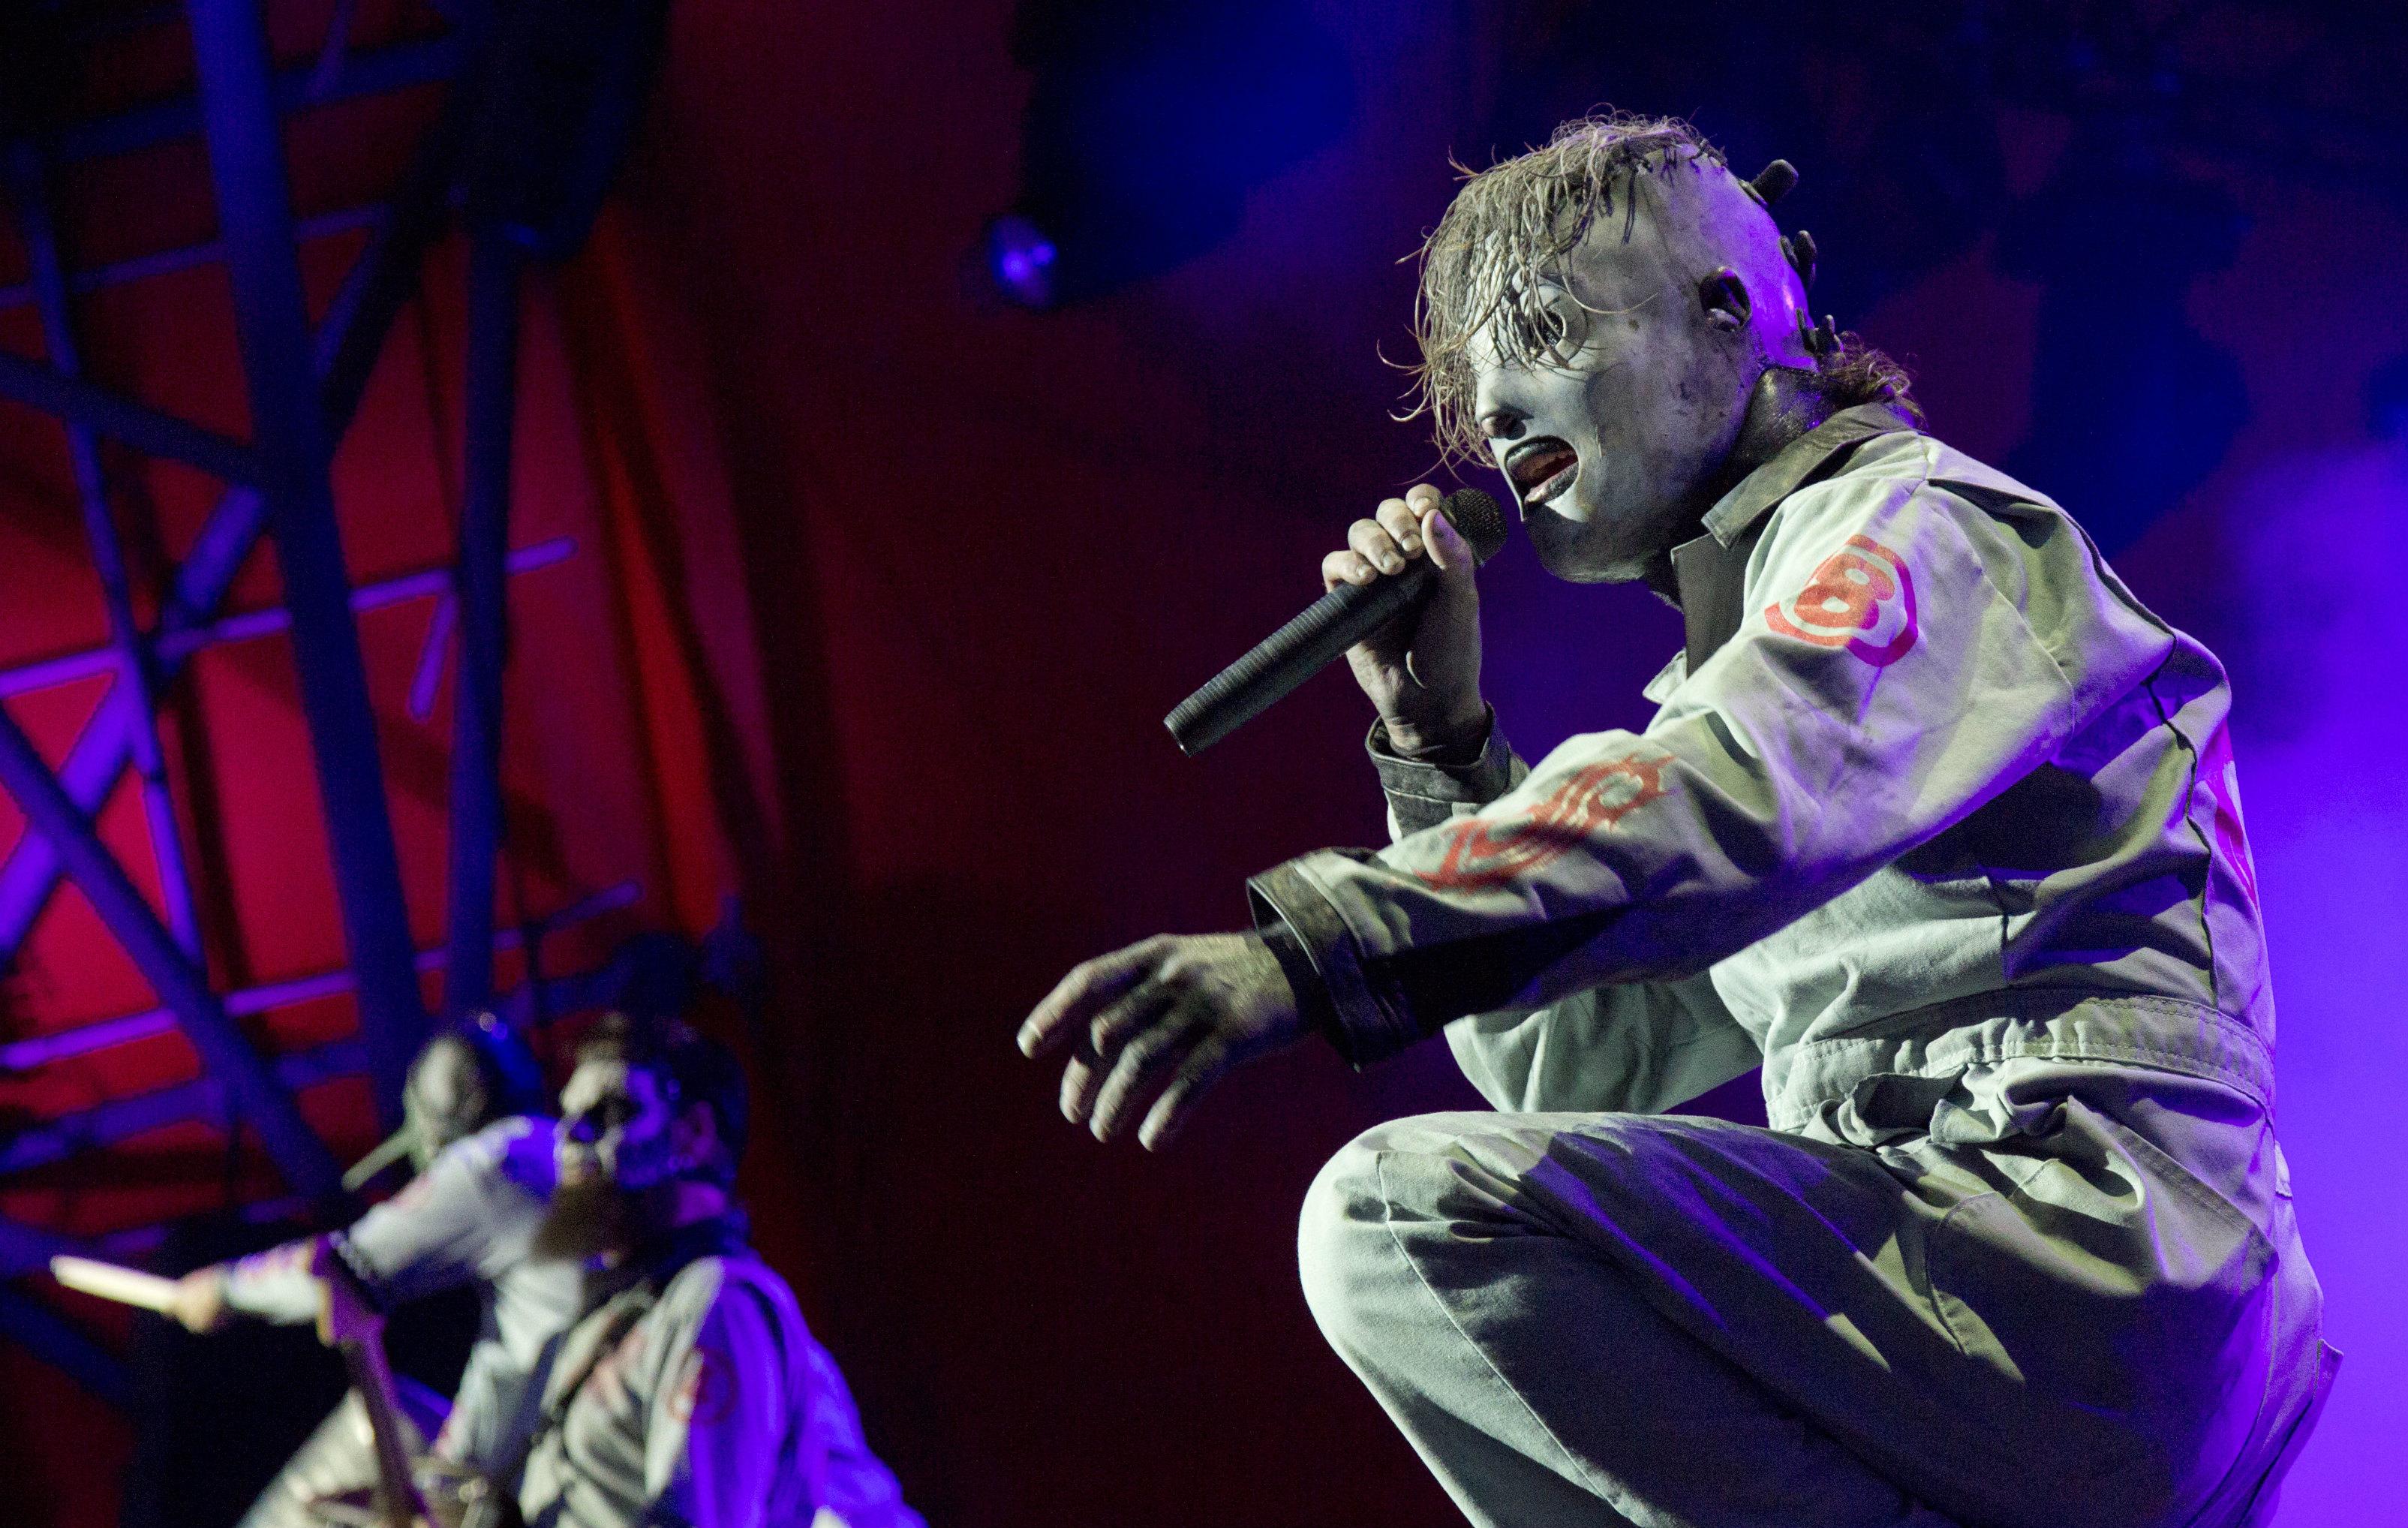 Slipknot announce re-release of seminal album 'All Hope Is Gone'